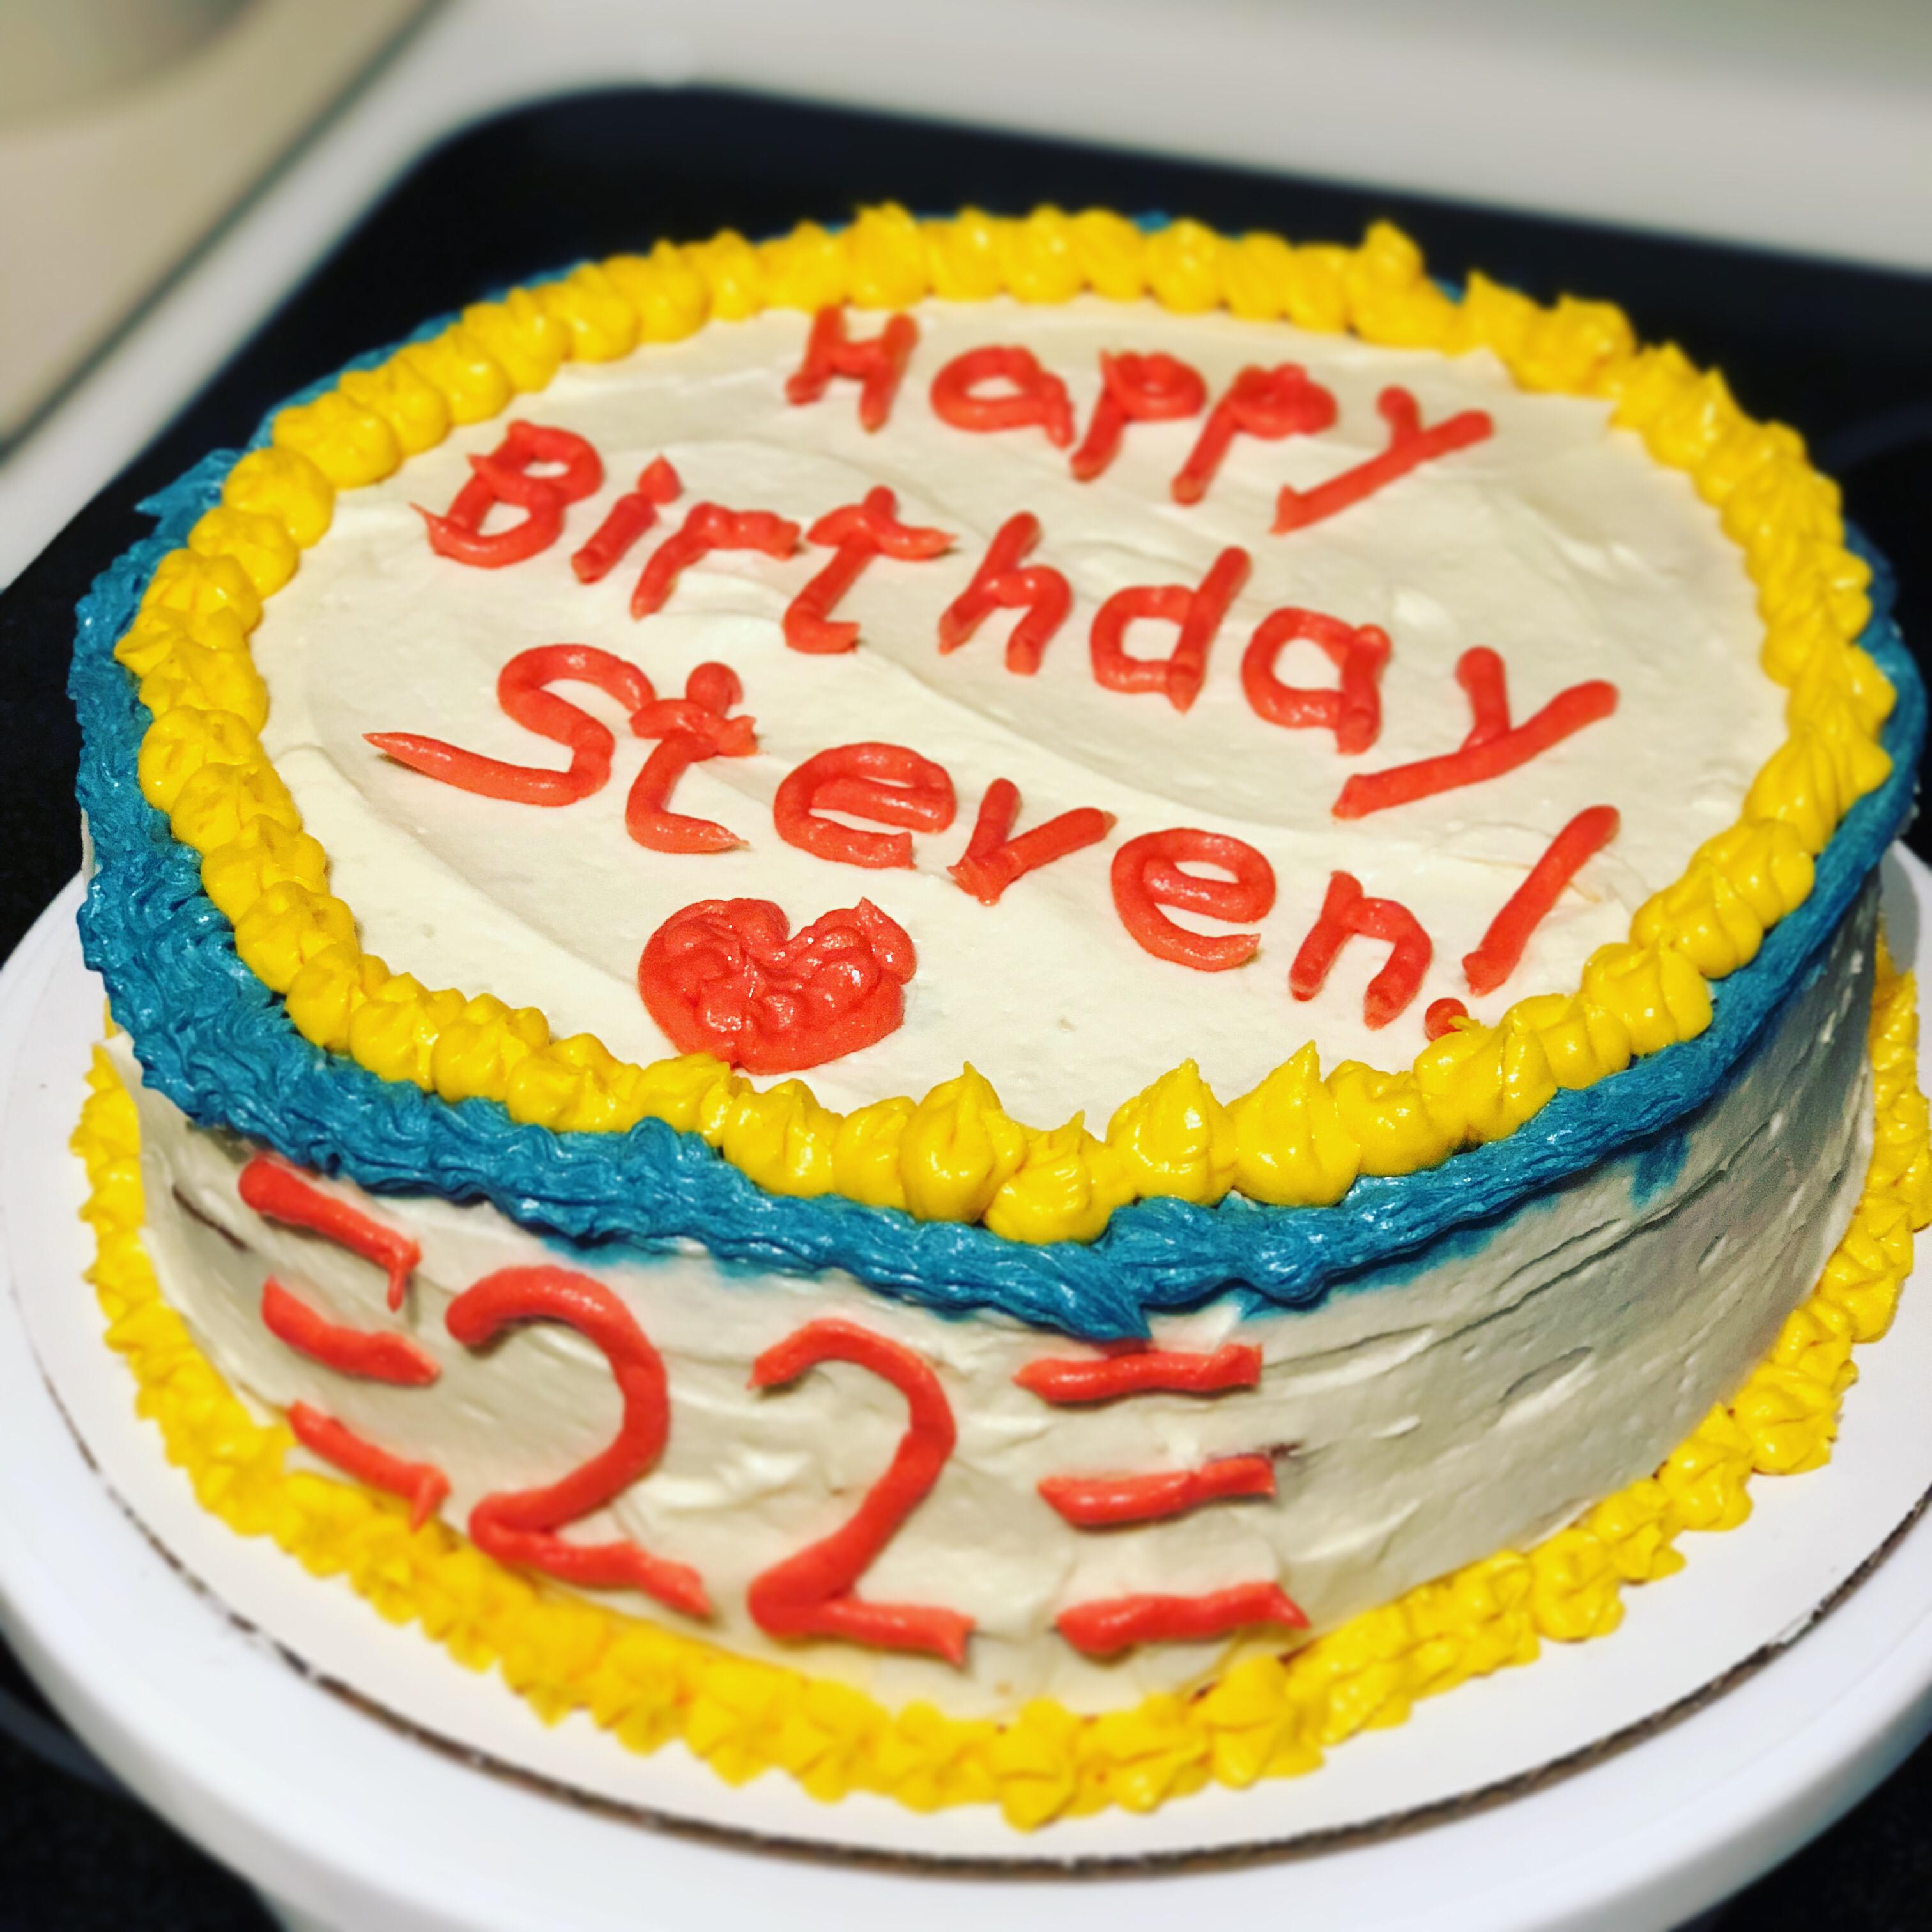 Surprising Happy Birthday Cake Allrecipes Funny Birthday Cards Online Fluifree Goldxyz